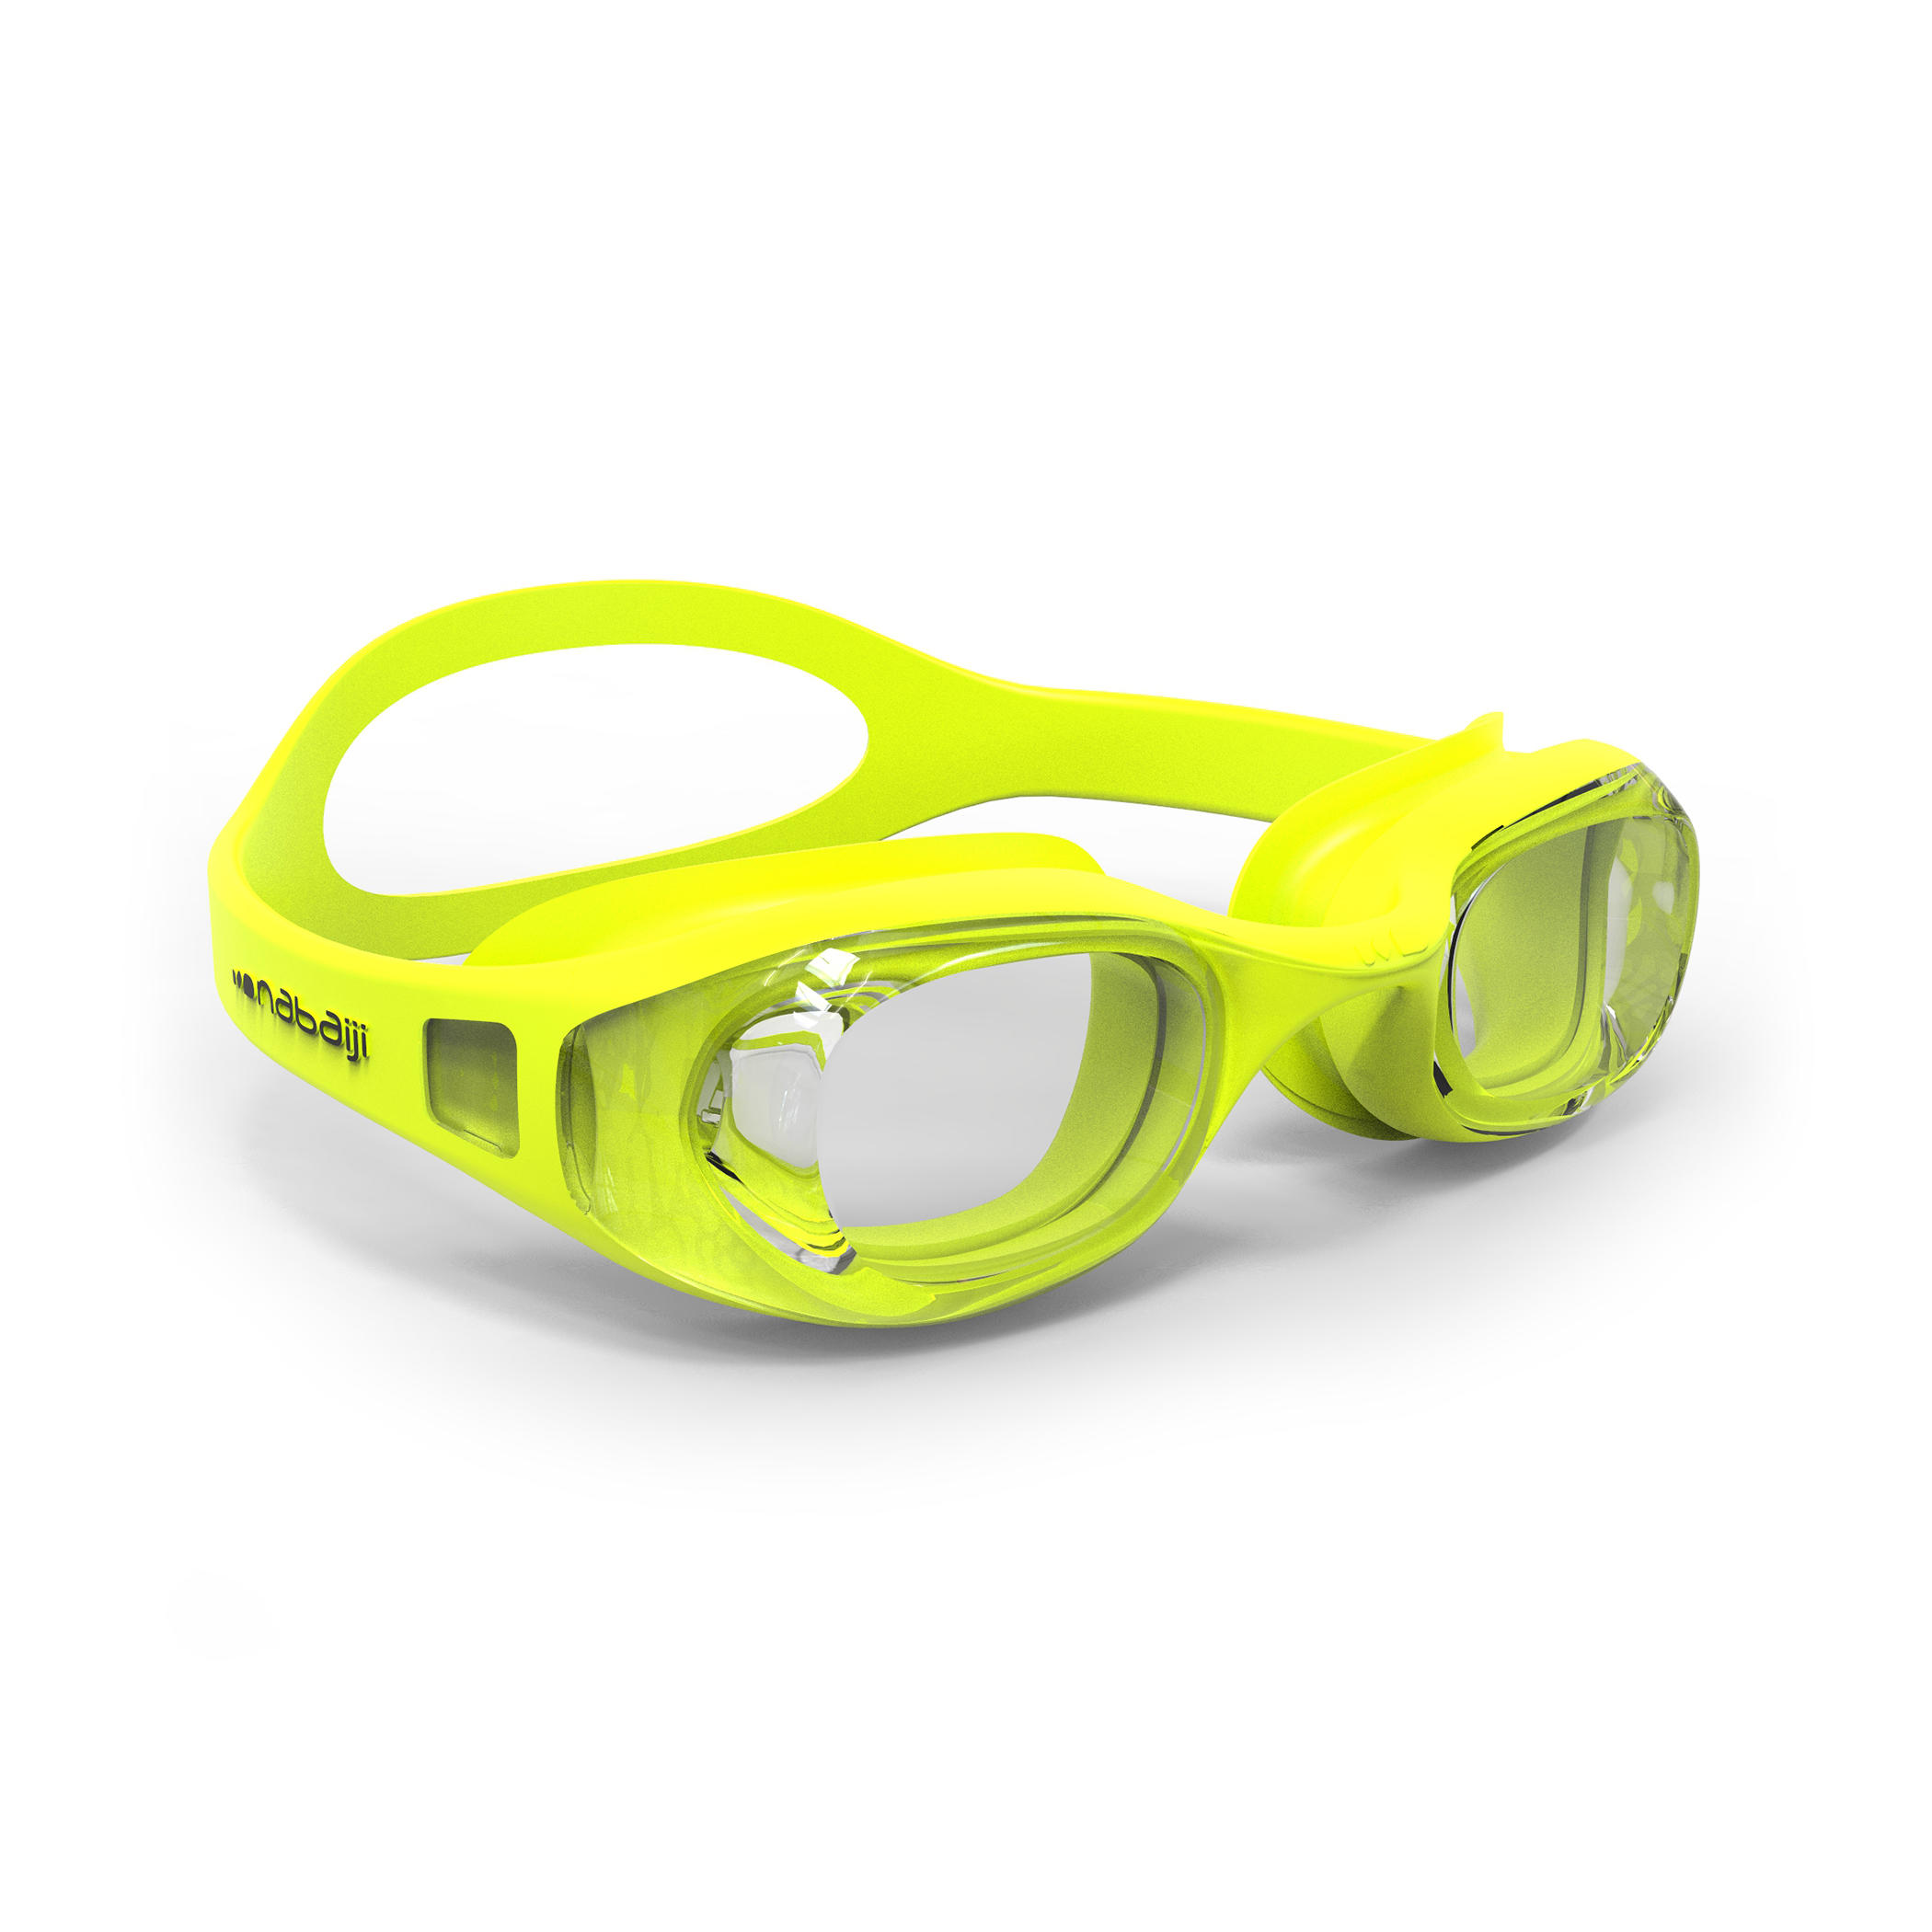 Ochelari Înot 100 Xbase Easy la Reducere poza